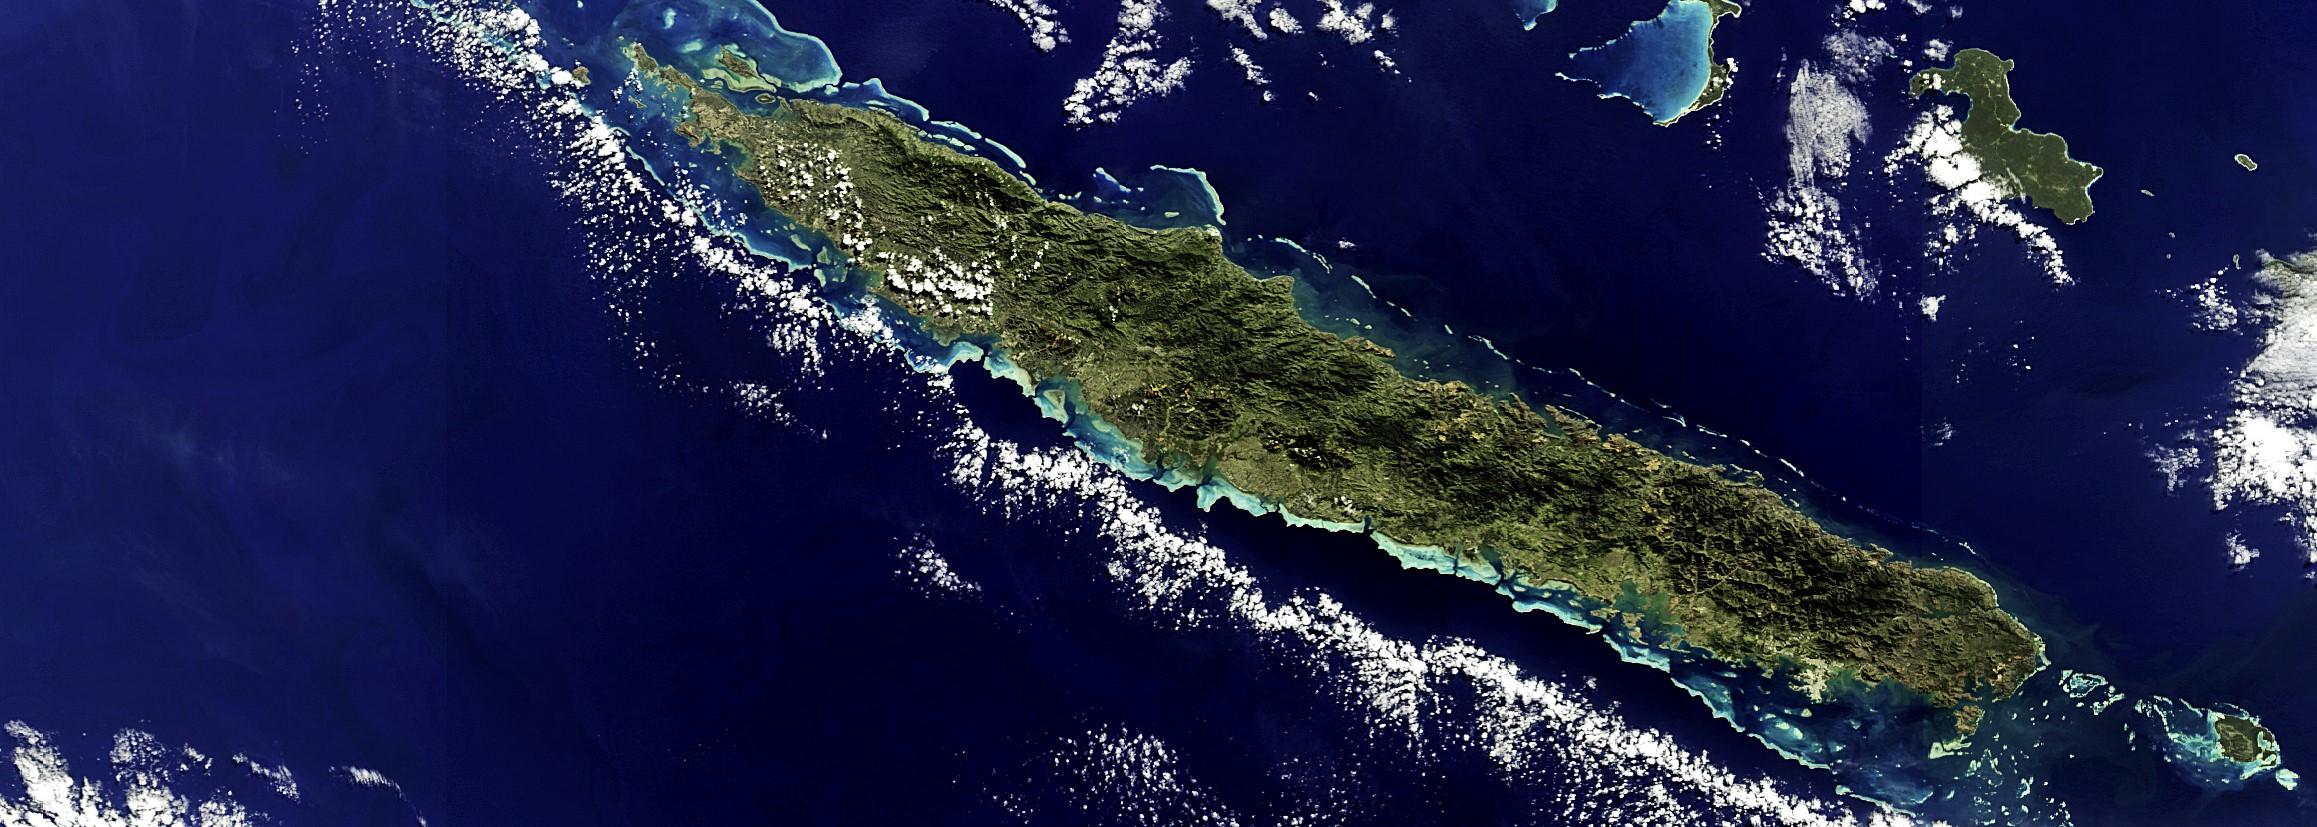 The New Caledonia archipelago (Photo: Envisat image via Creative Commons)